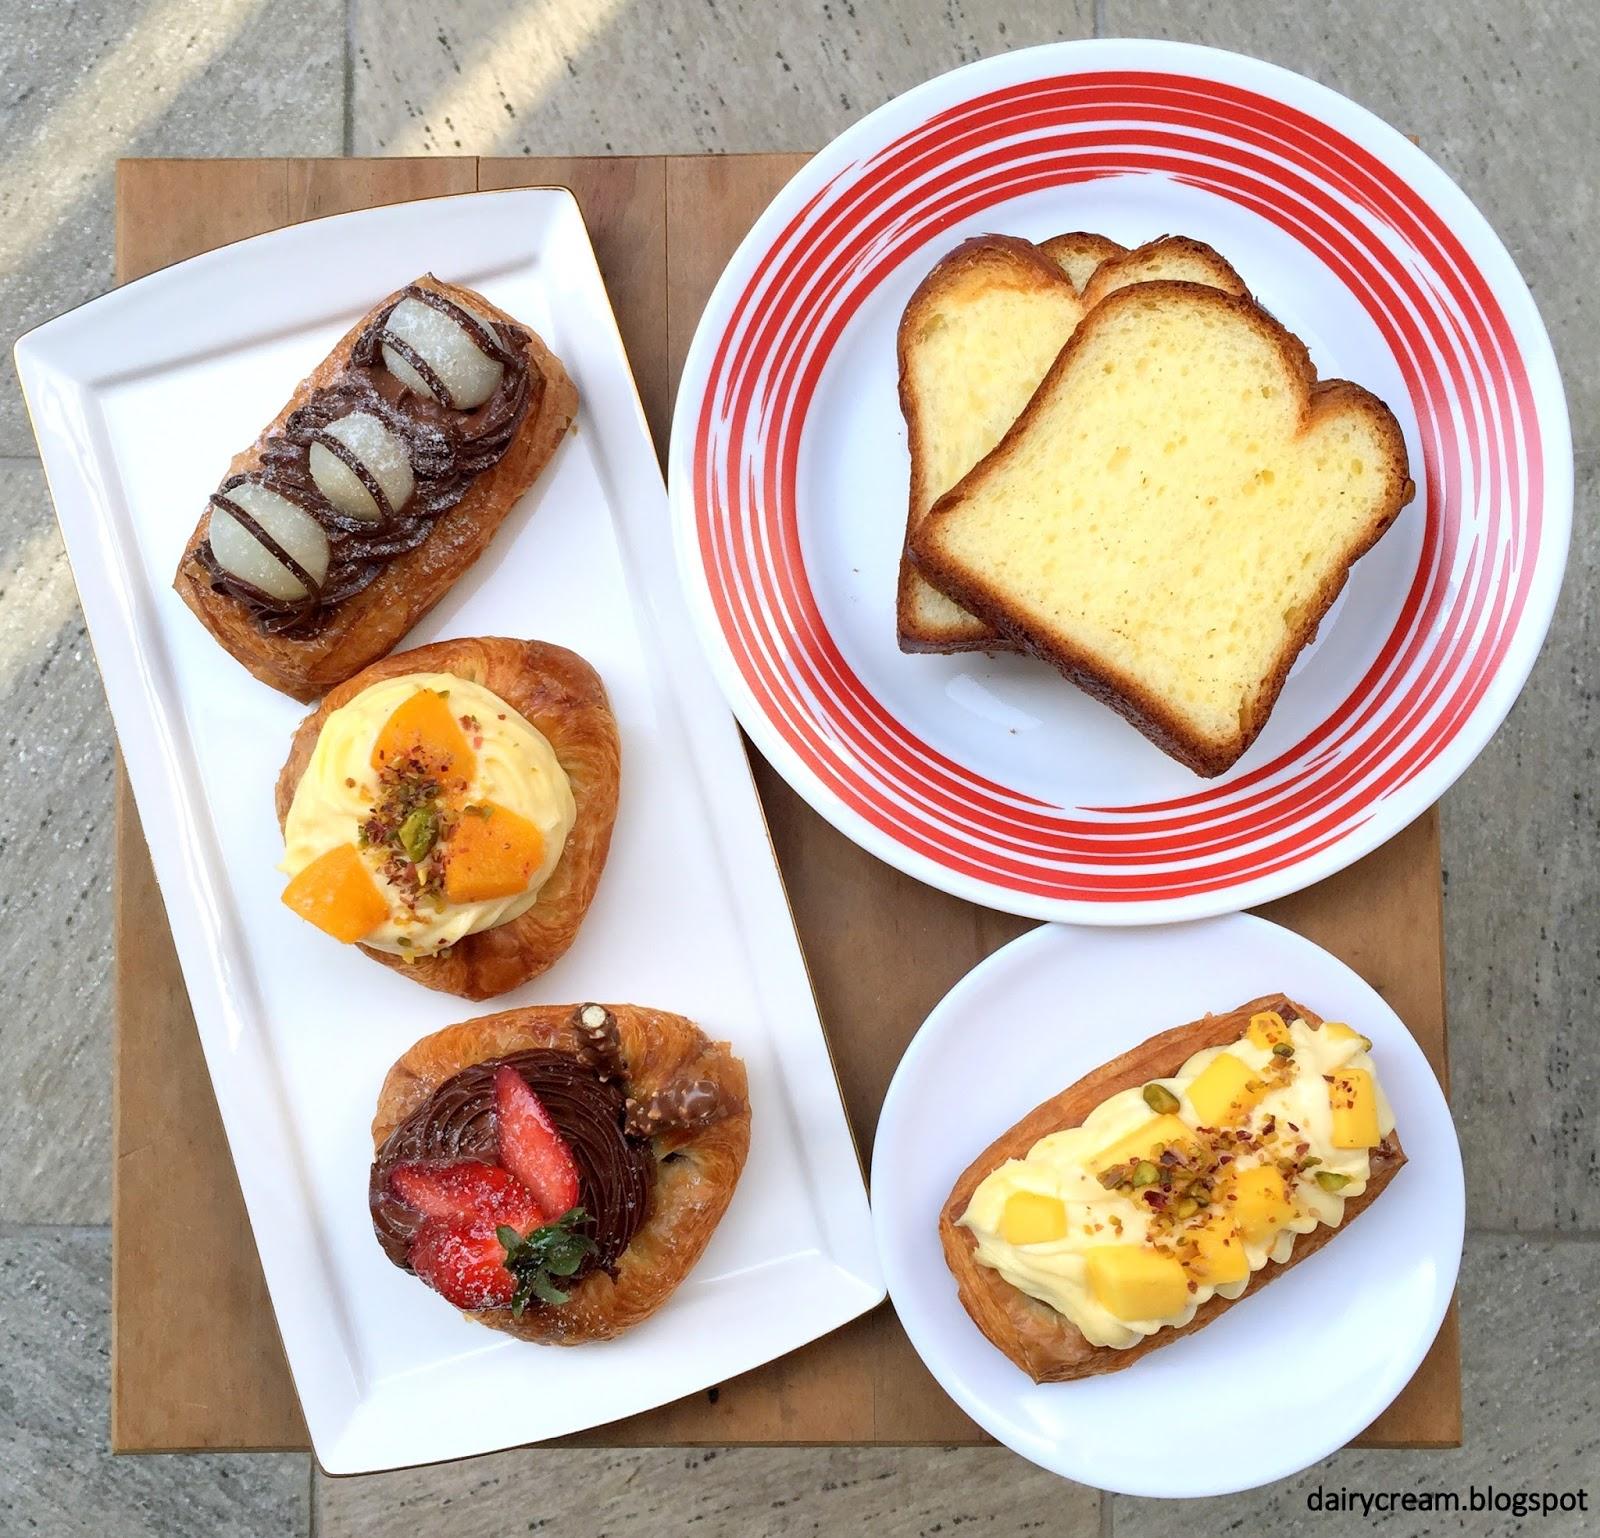 Brioche French Bakery And Cafe Saint Joseph Missouri